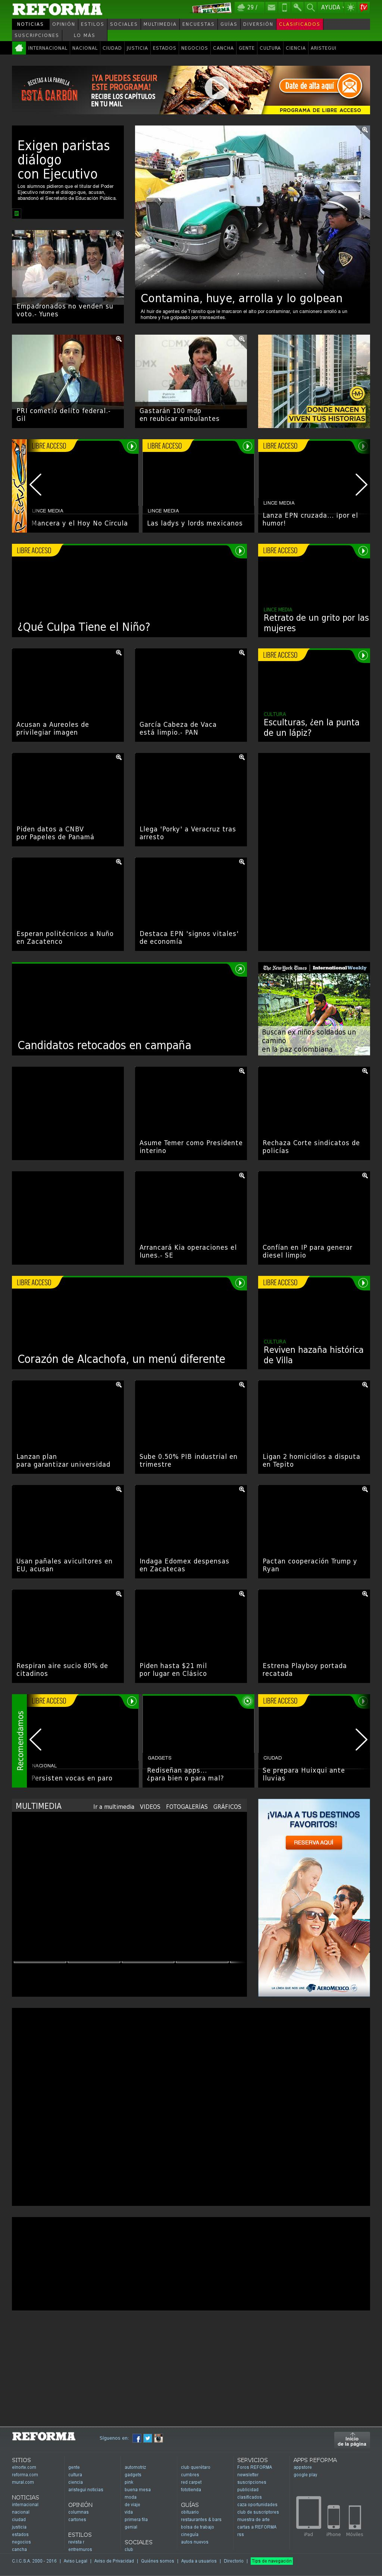 Reforma.com at Thursday May 12, 2016, 10:18 p.m. UTC